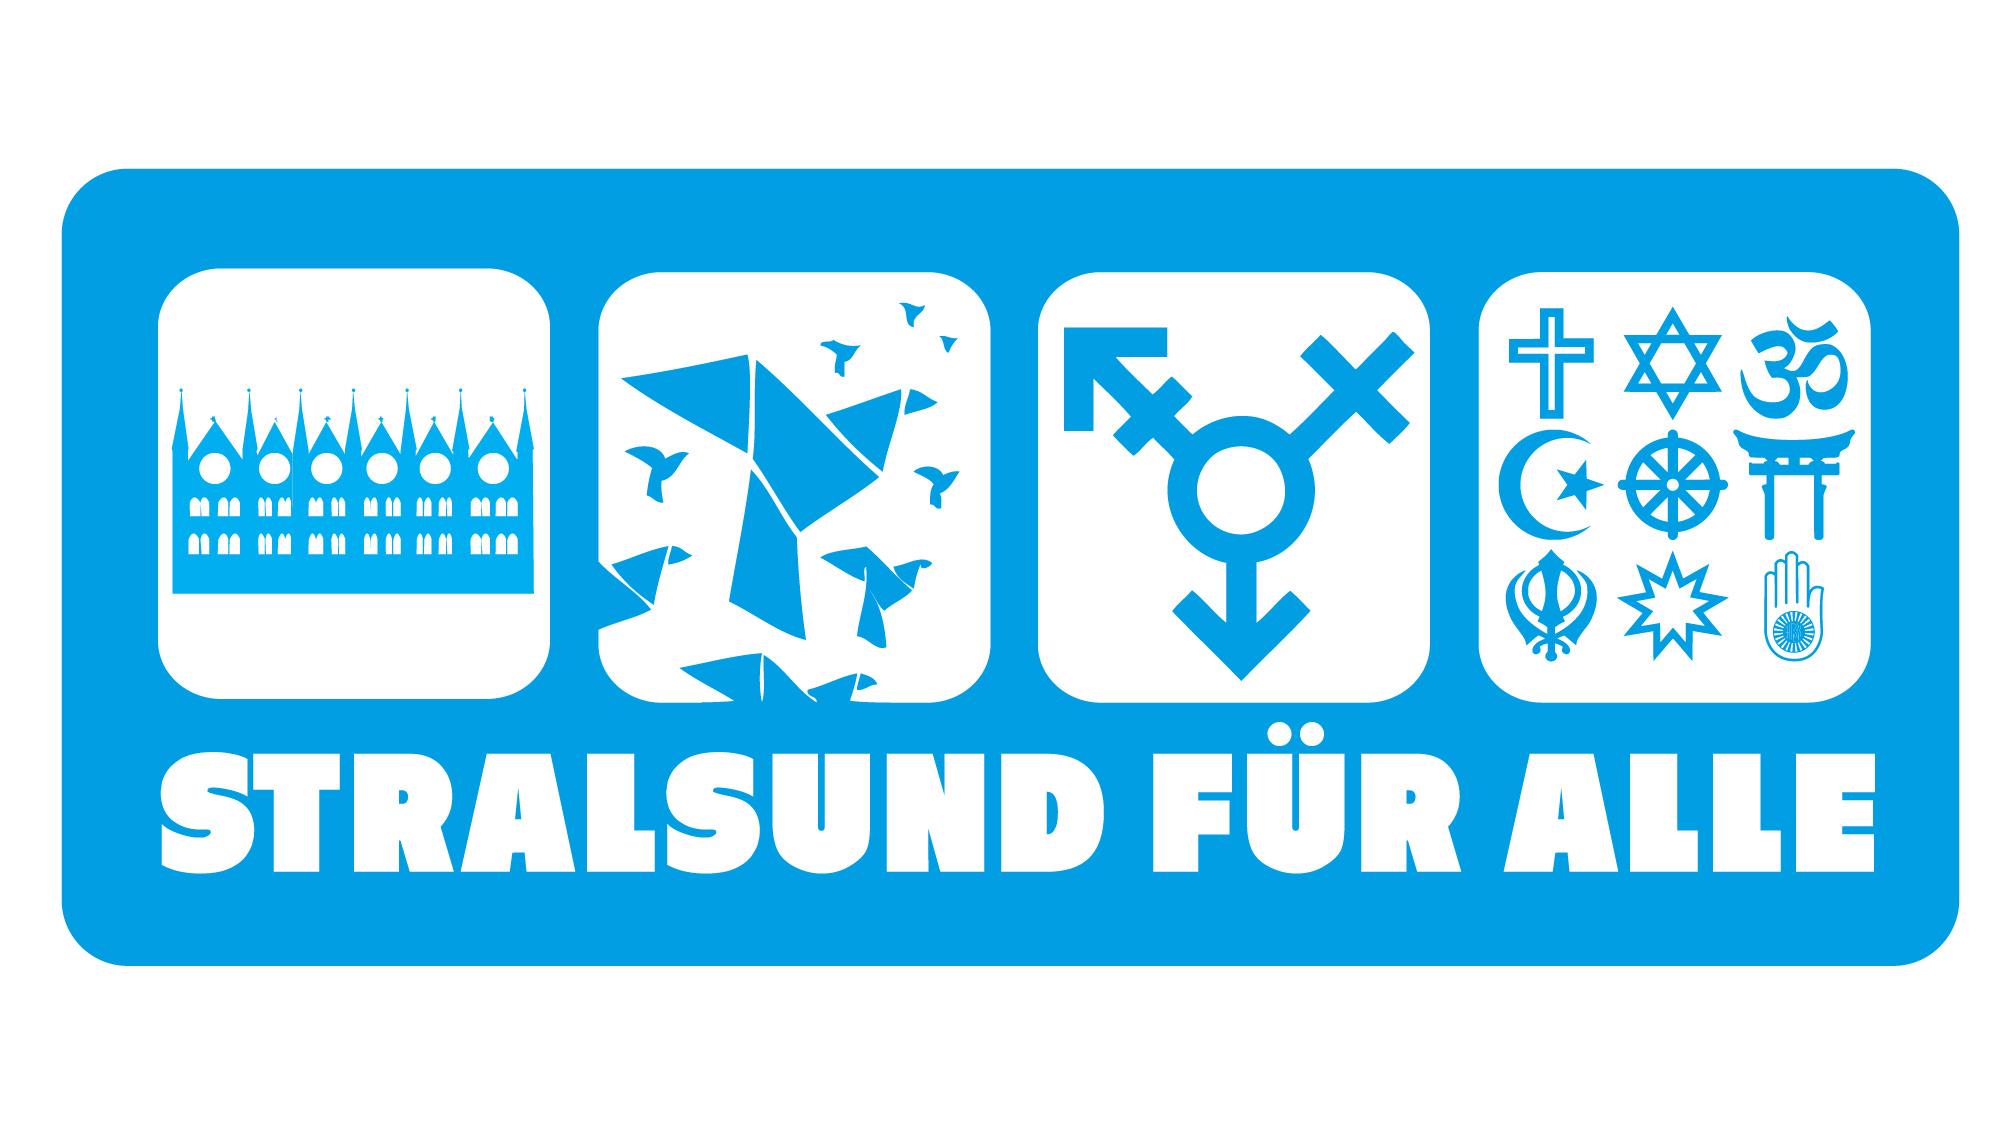 09. August: Kinderfest im Bürgergarten statt bei der NPD